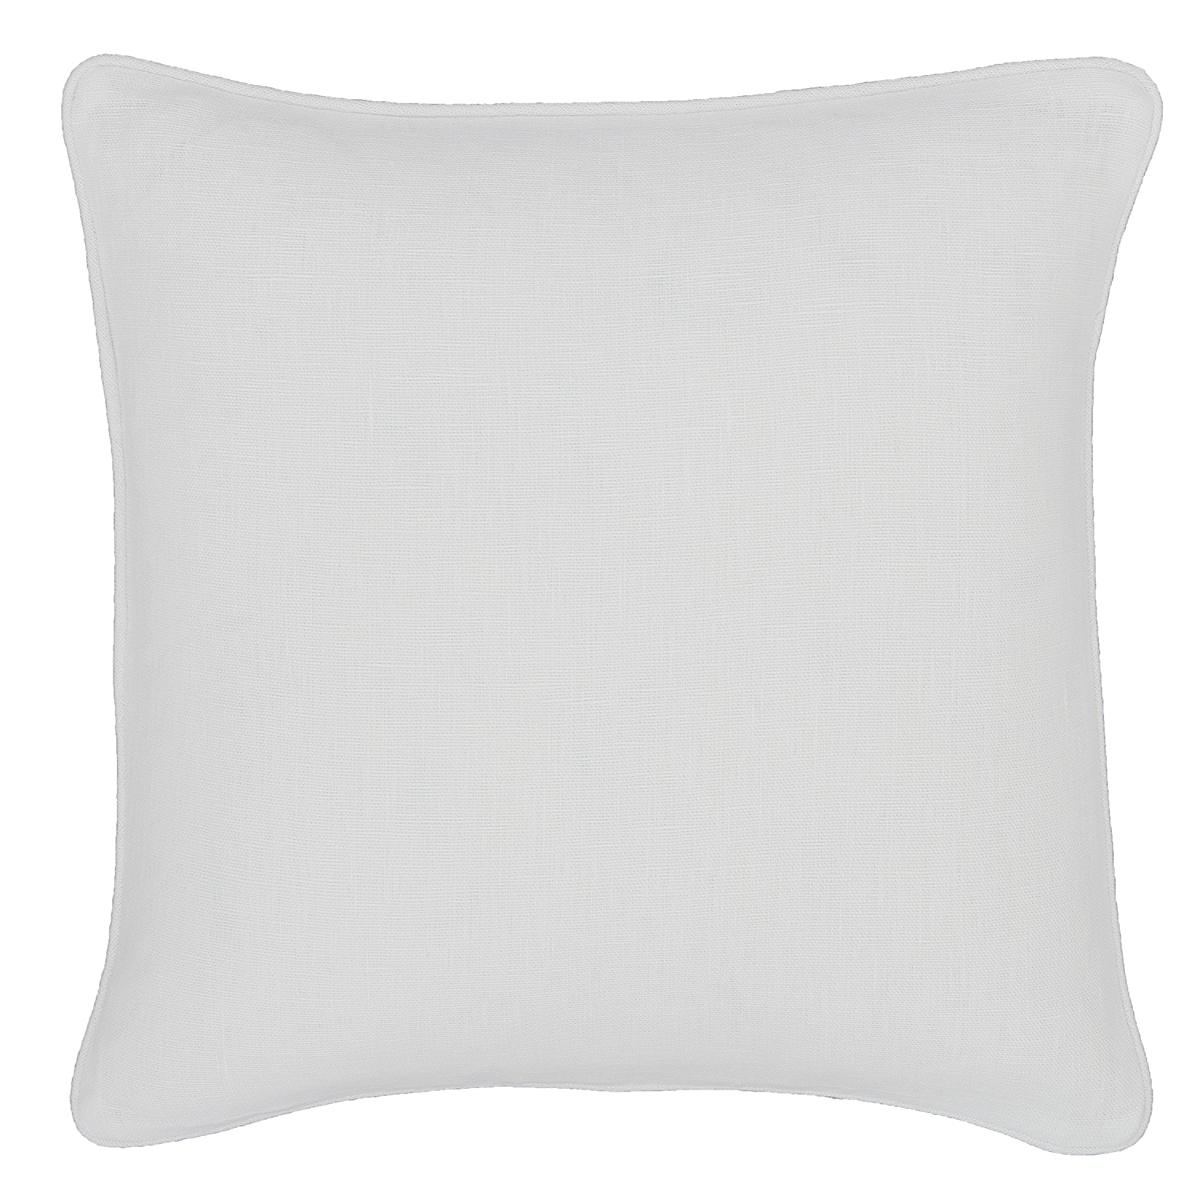 duvet - coverlet - sheet set - pillow sham - maine cottage® White Decorative Pillows